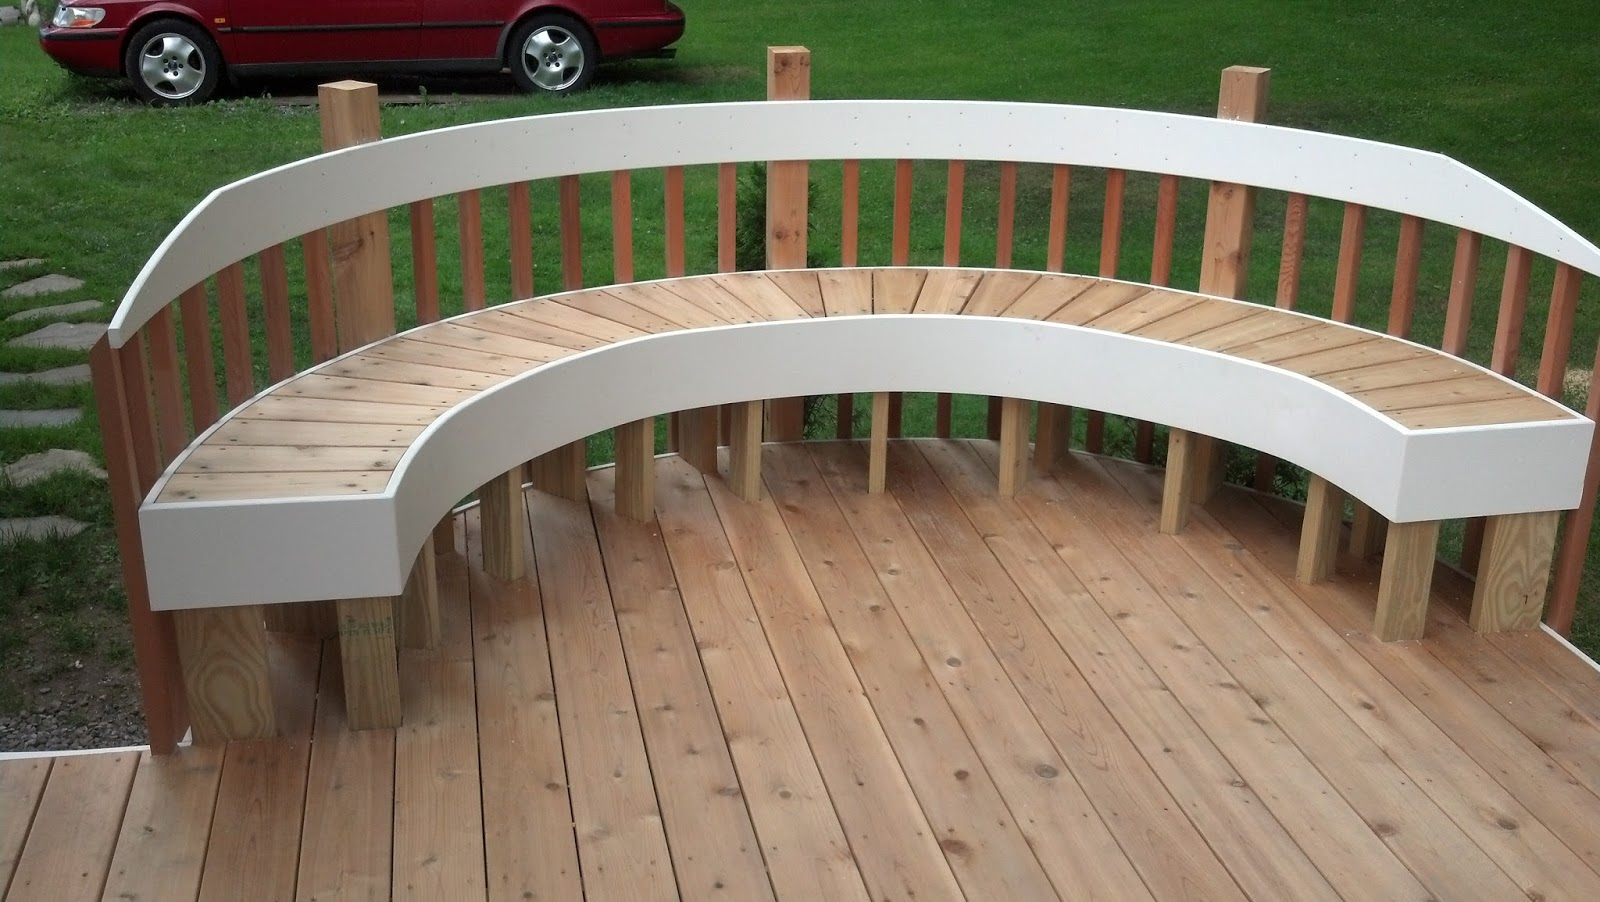 David Randall Woodworking: Curve Cedar Deck & Bench with ...